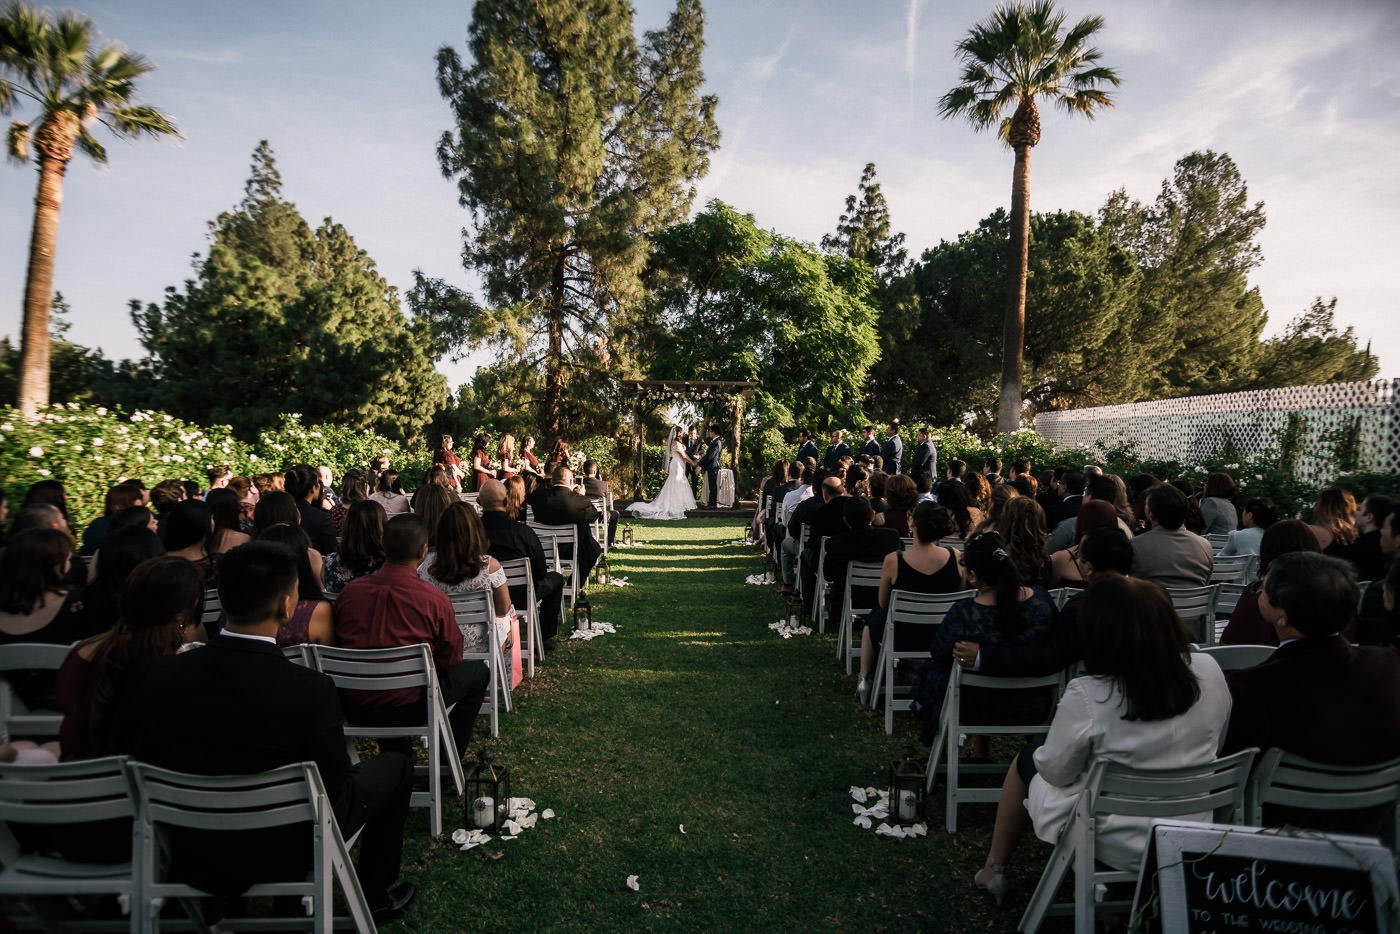 Knollwood country club wedding ceremony rose garden location.